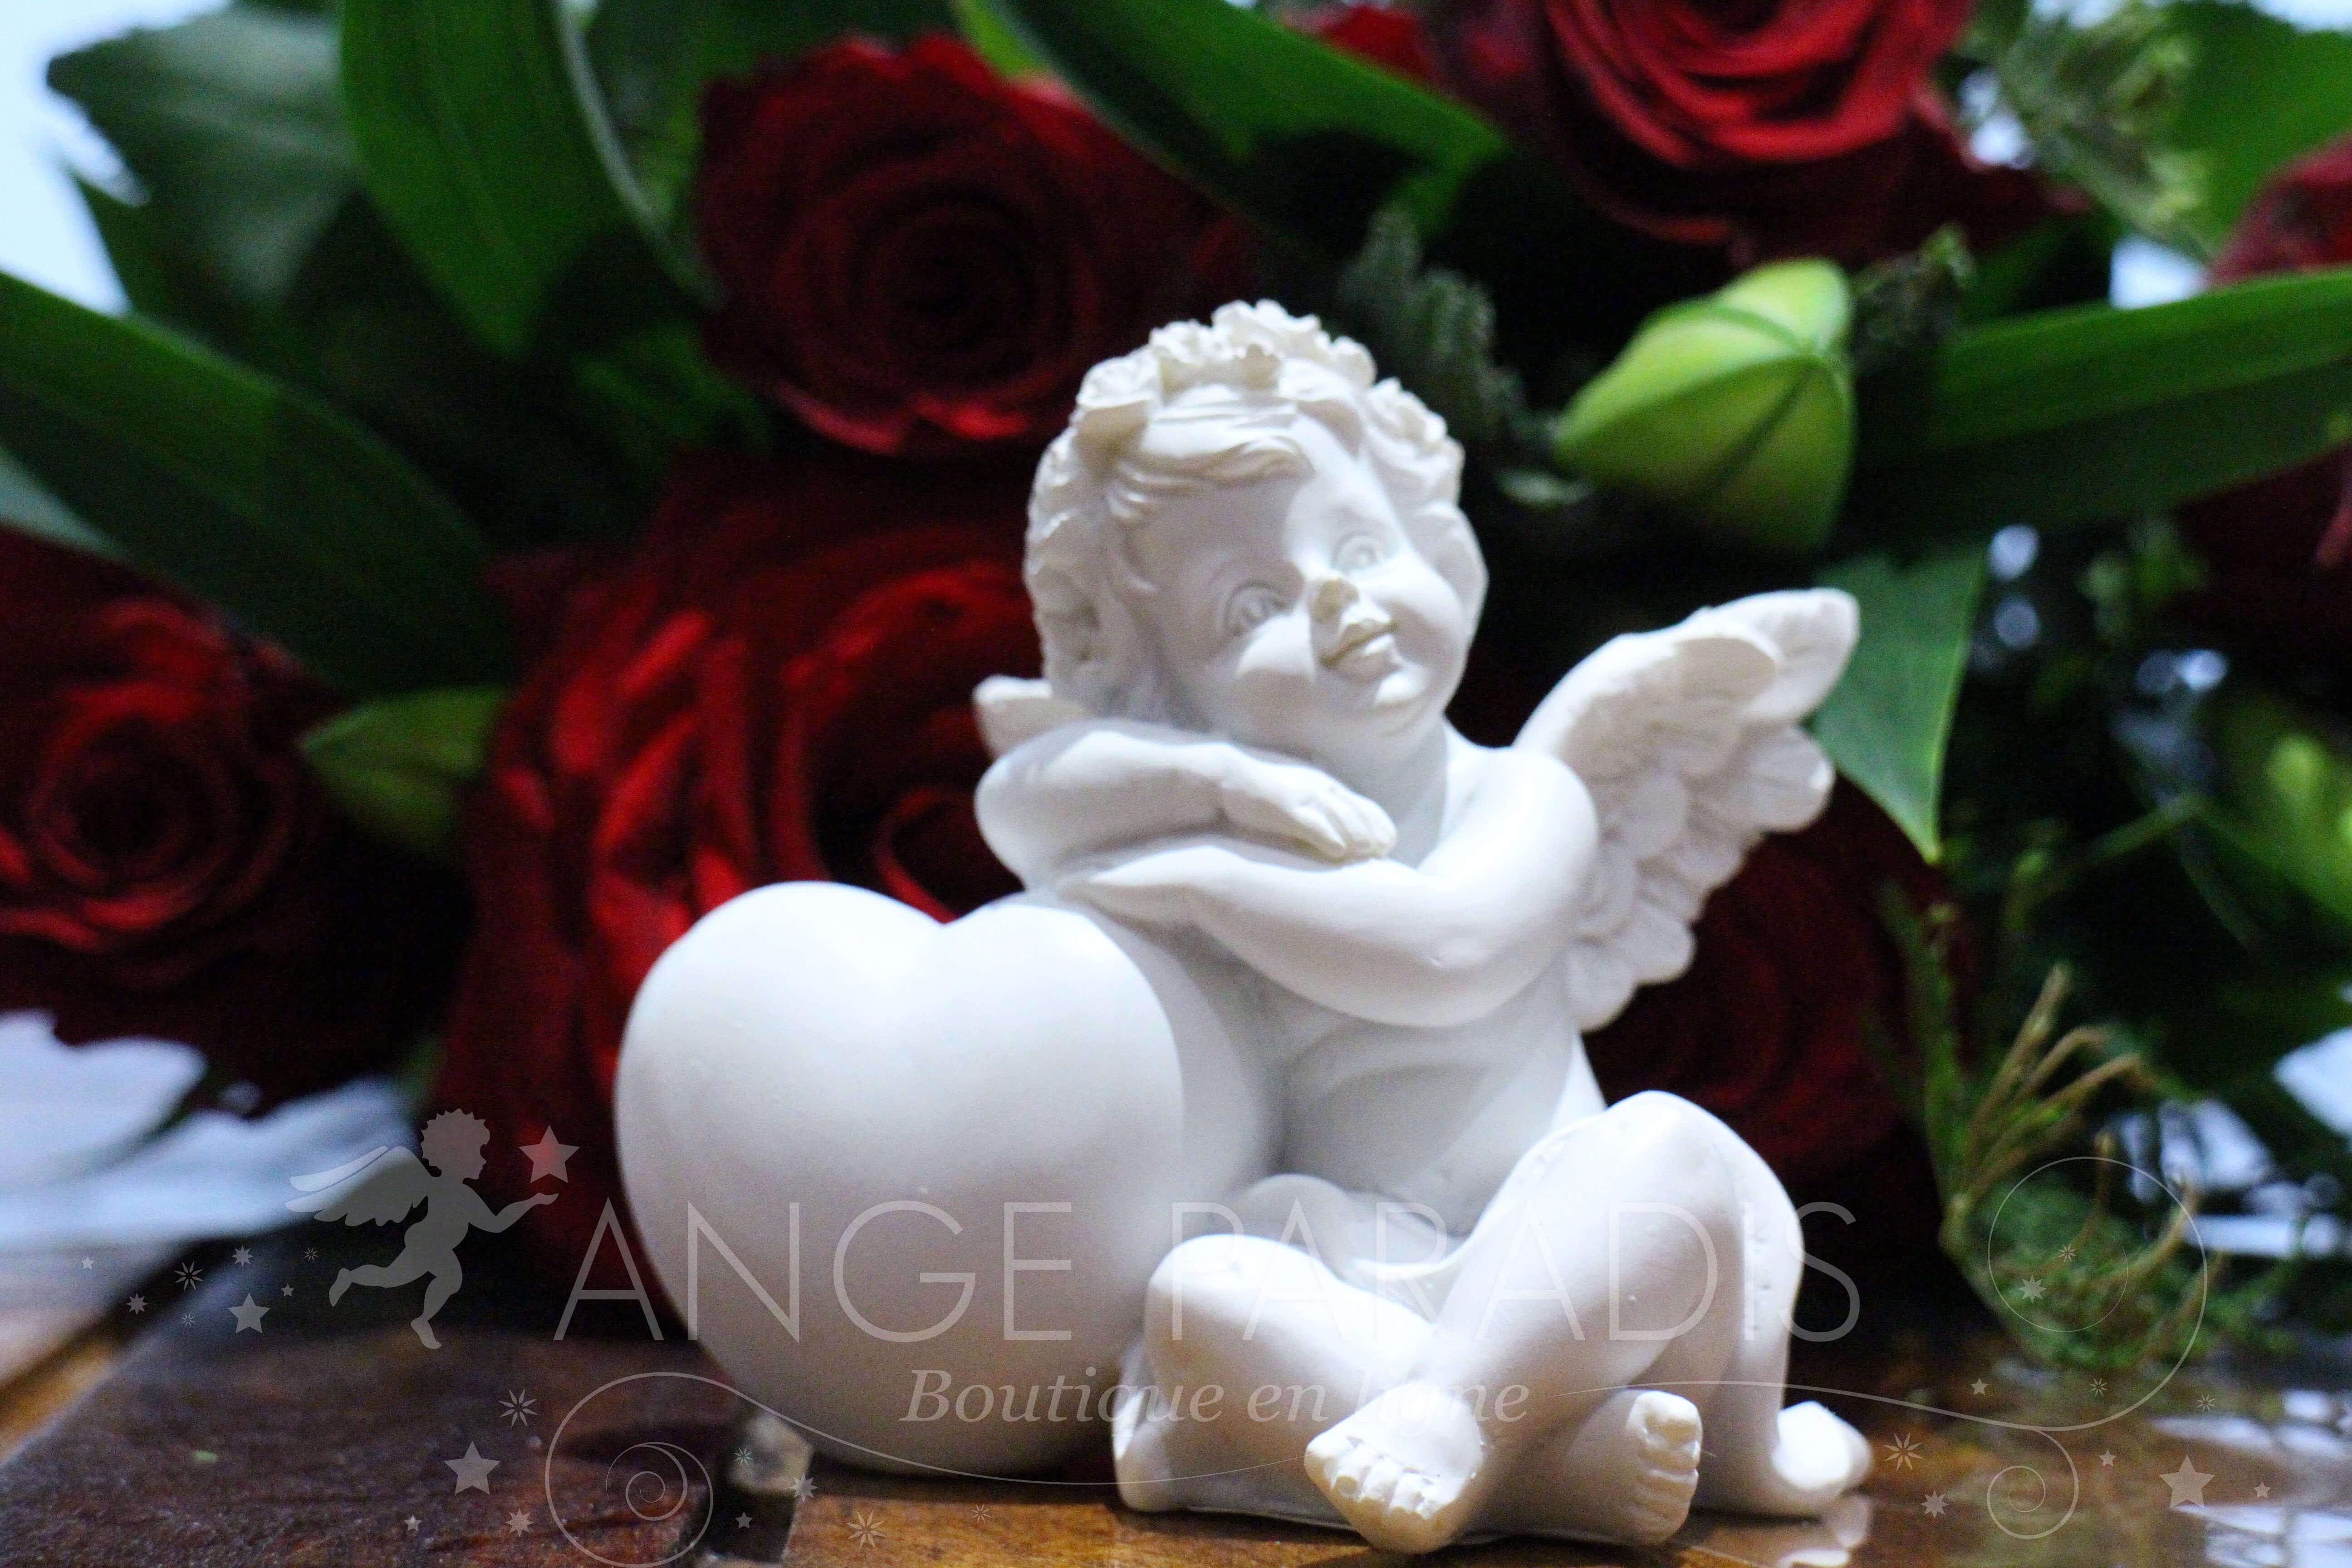 ANGE ROMANTIQUE